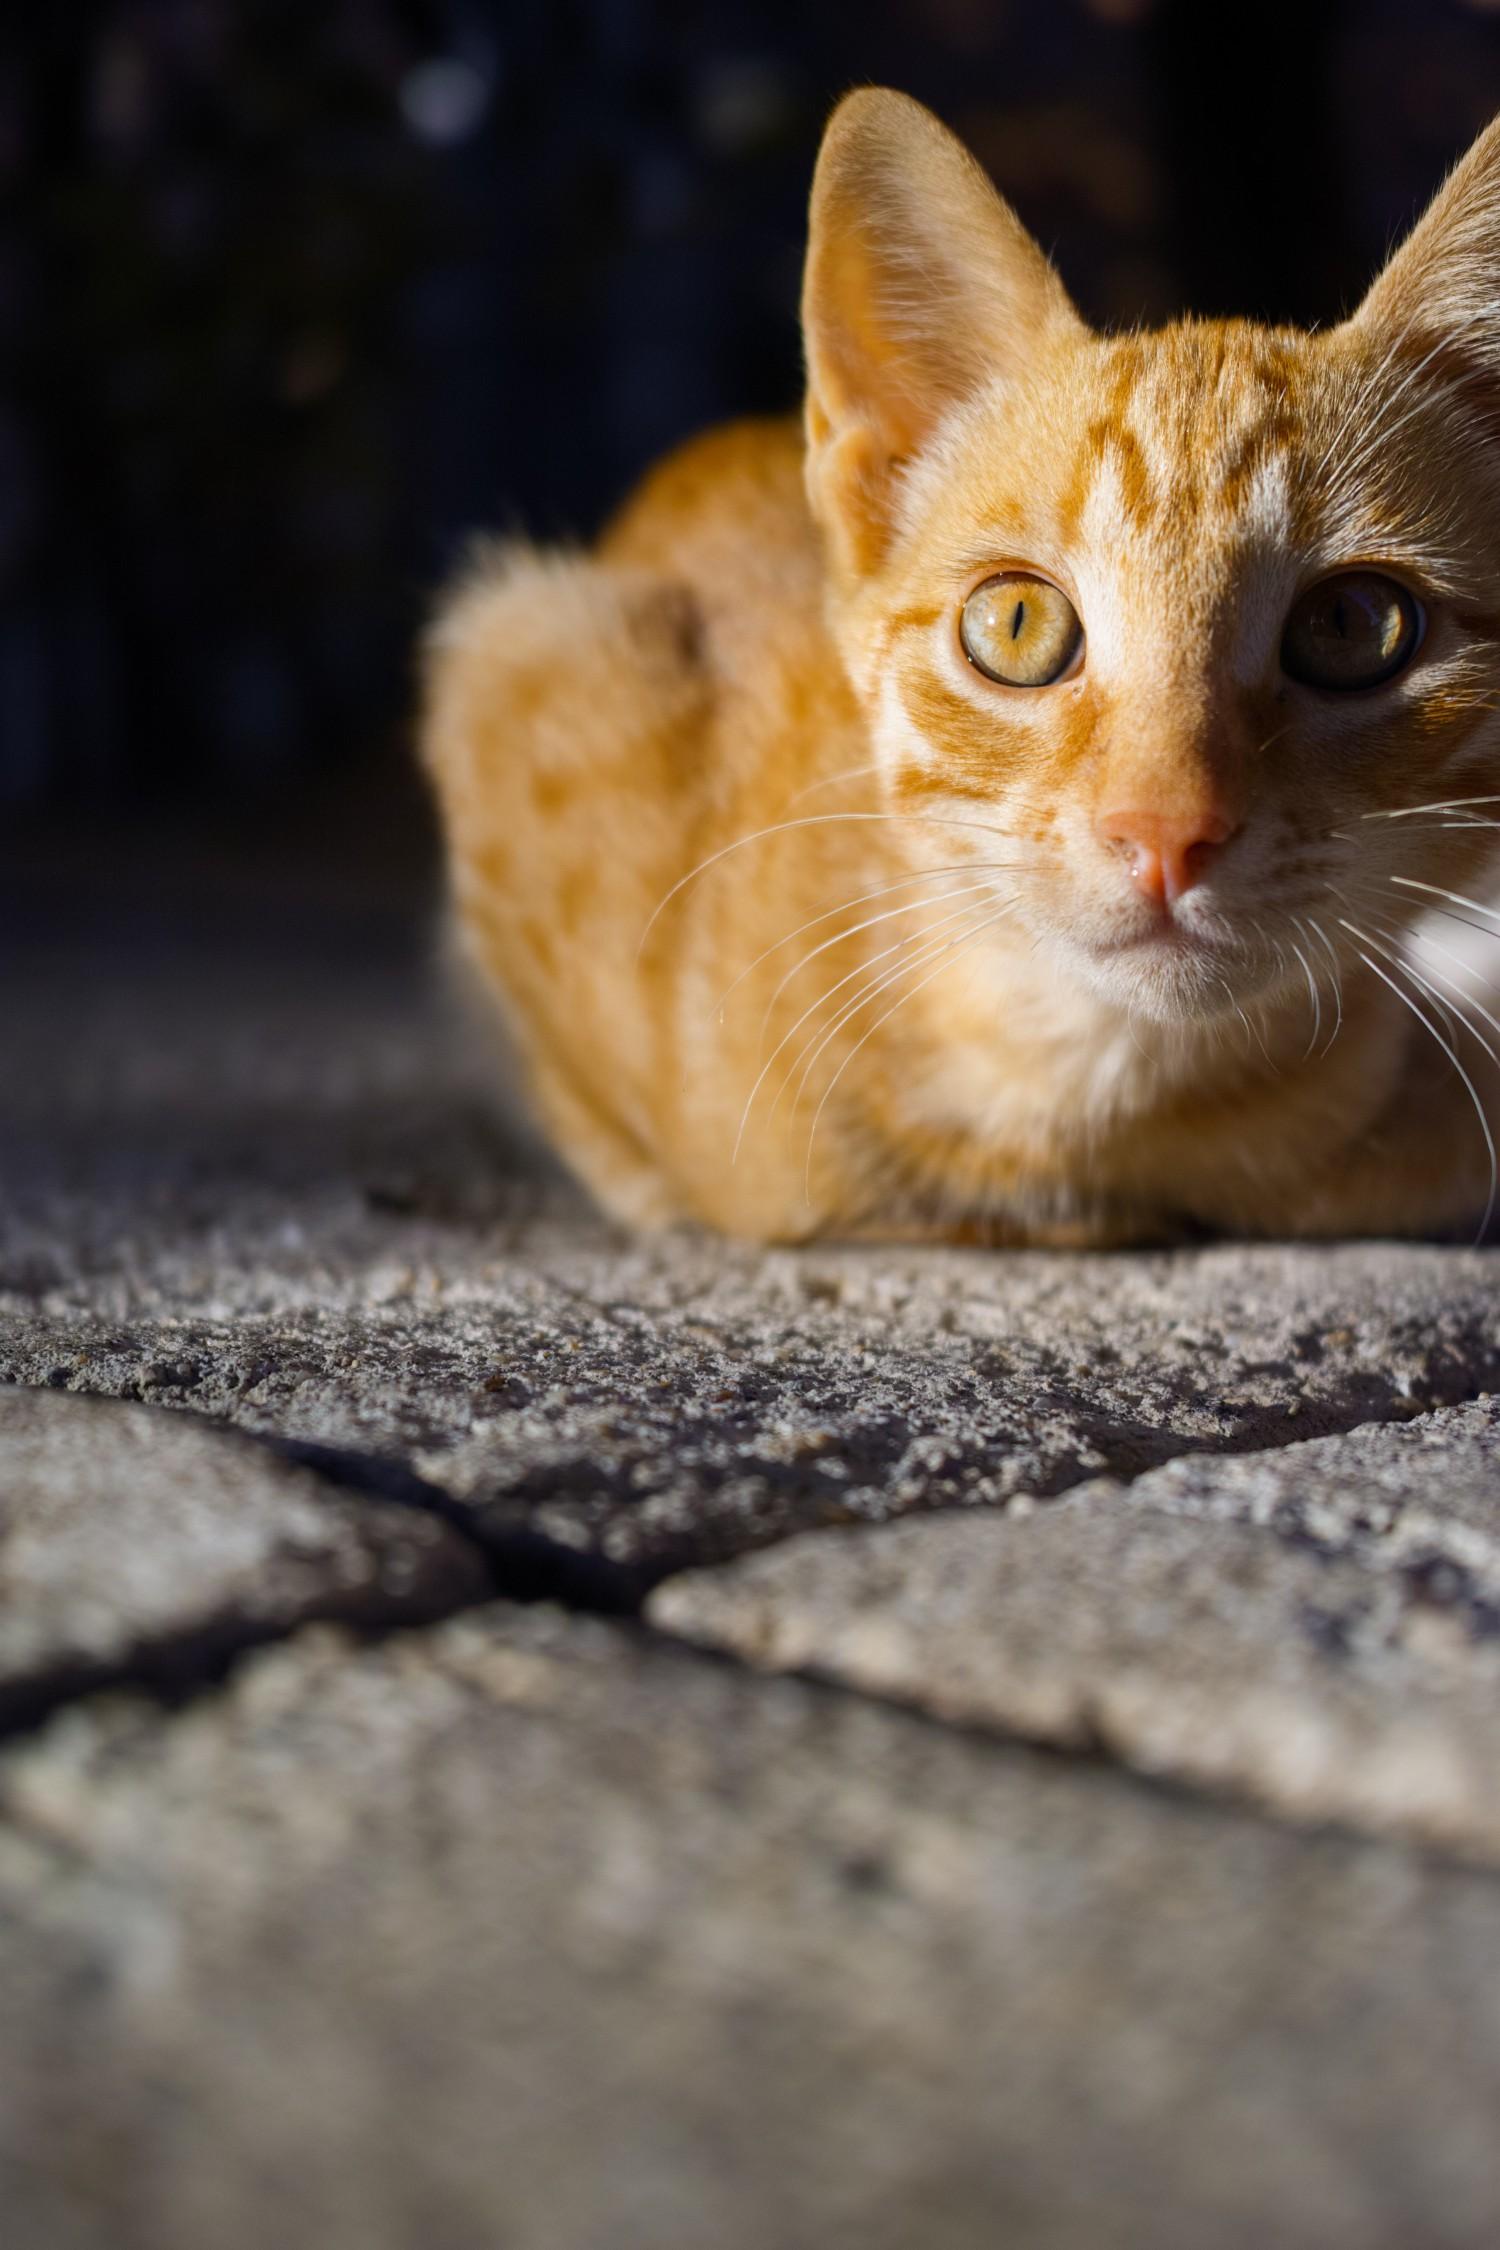 Serienbilder unterstützen das Timing | Haustiere fotografieren